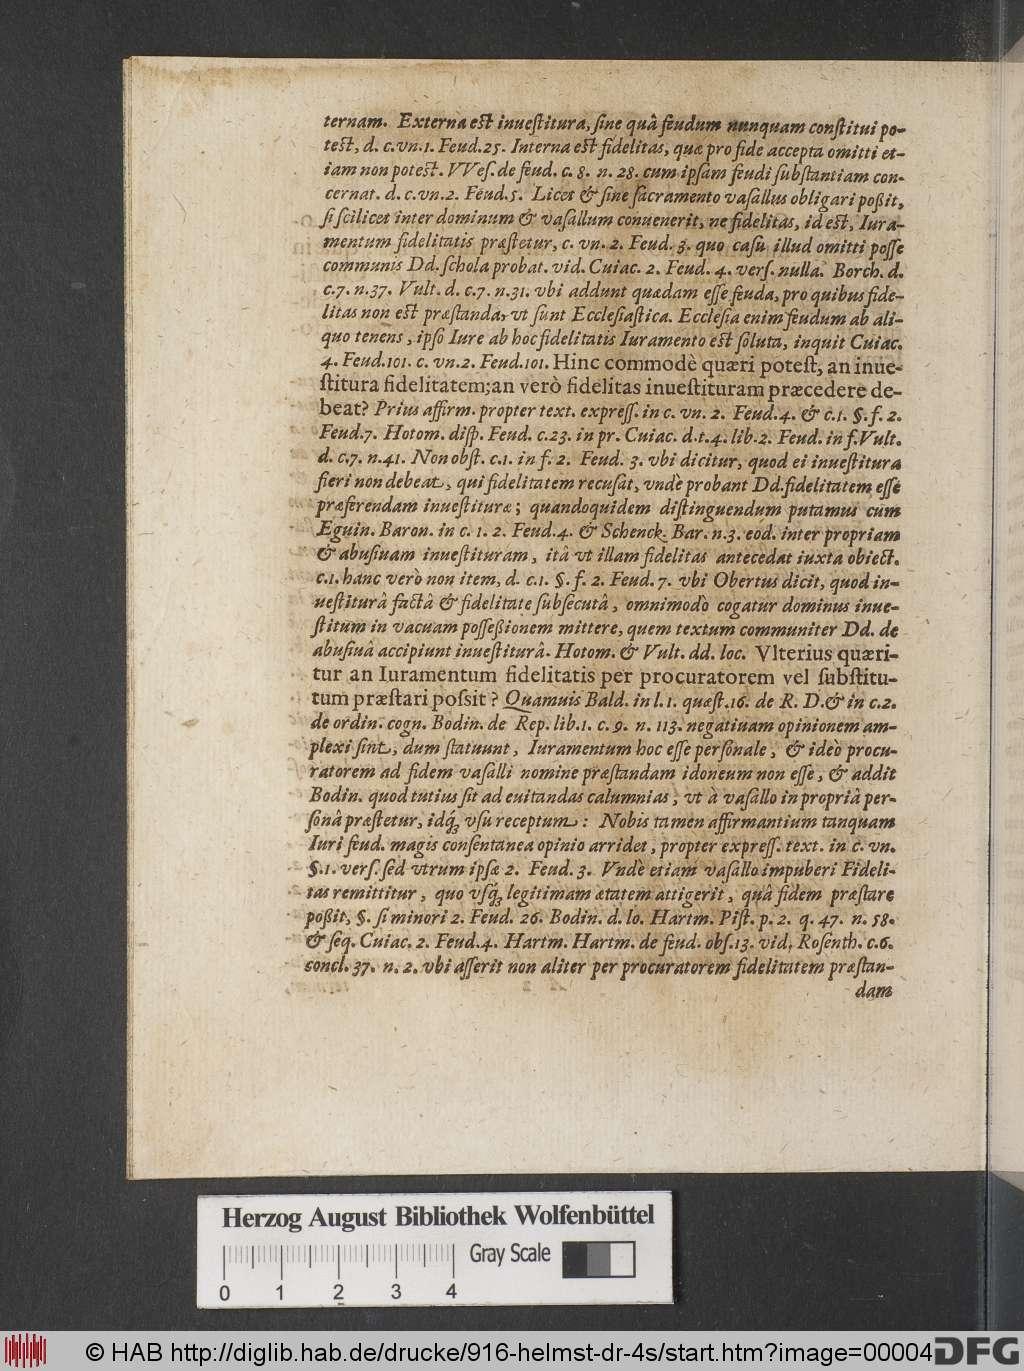 http://diglib.hab.de/drucke/916-helmst-dr-4s/00004.jpg